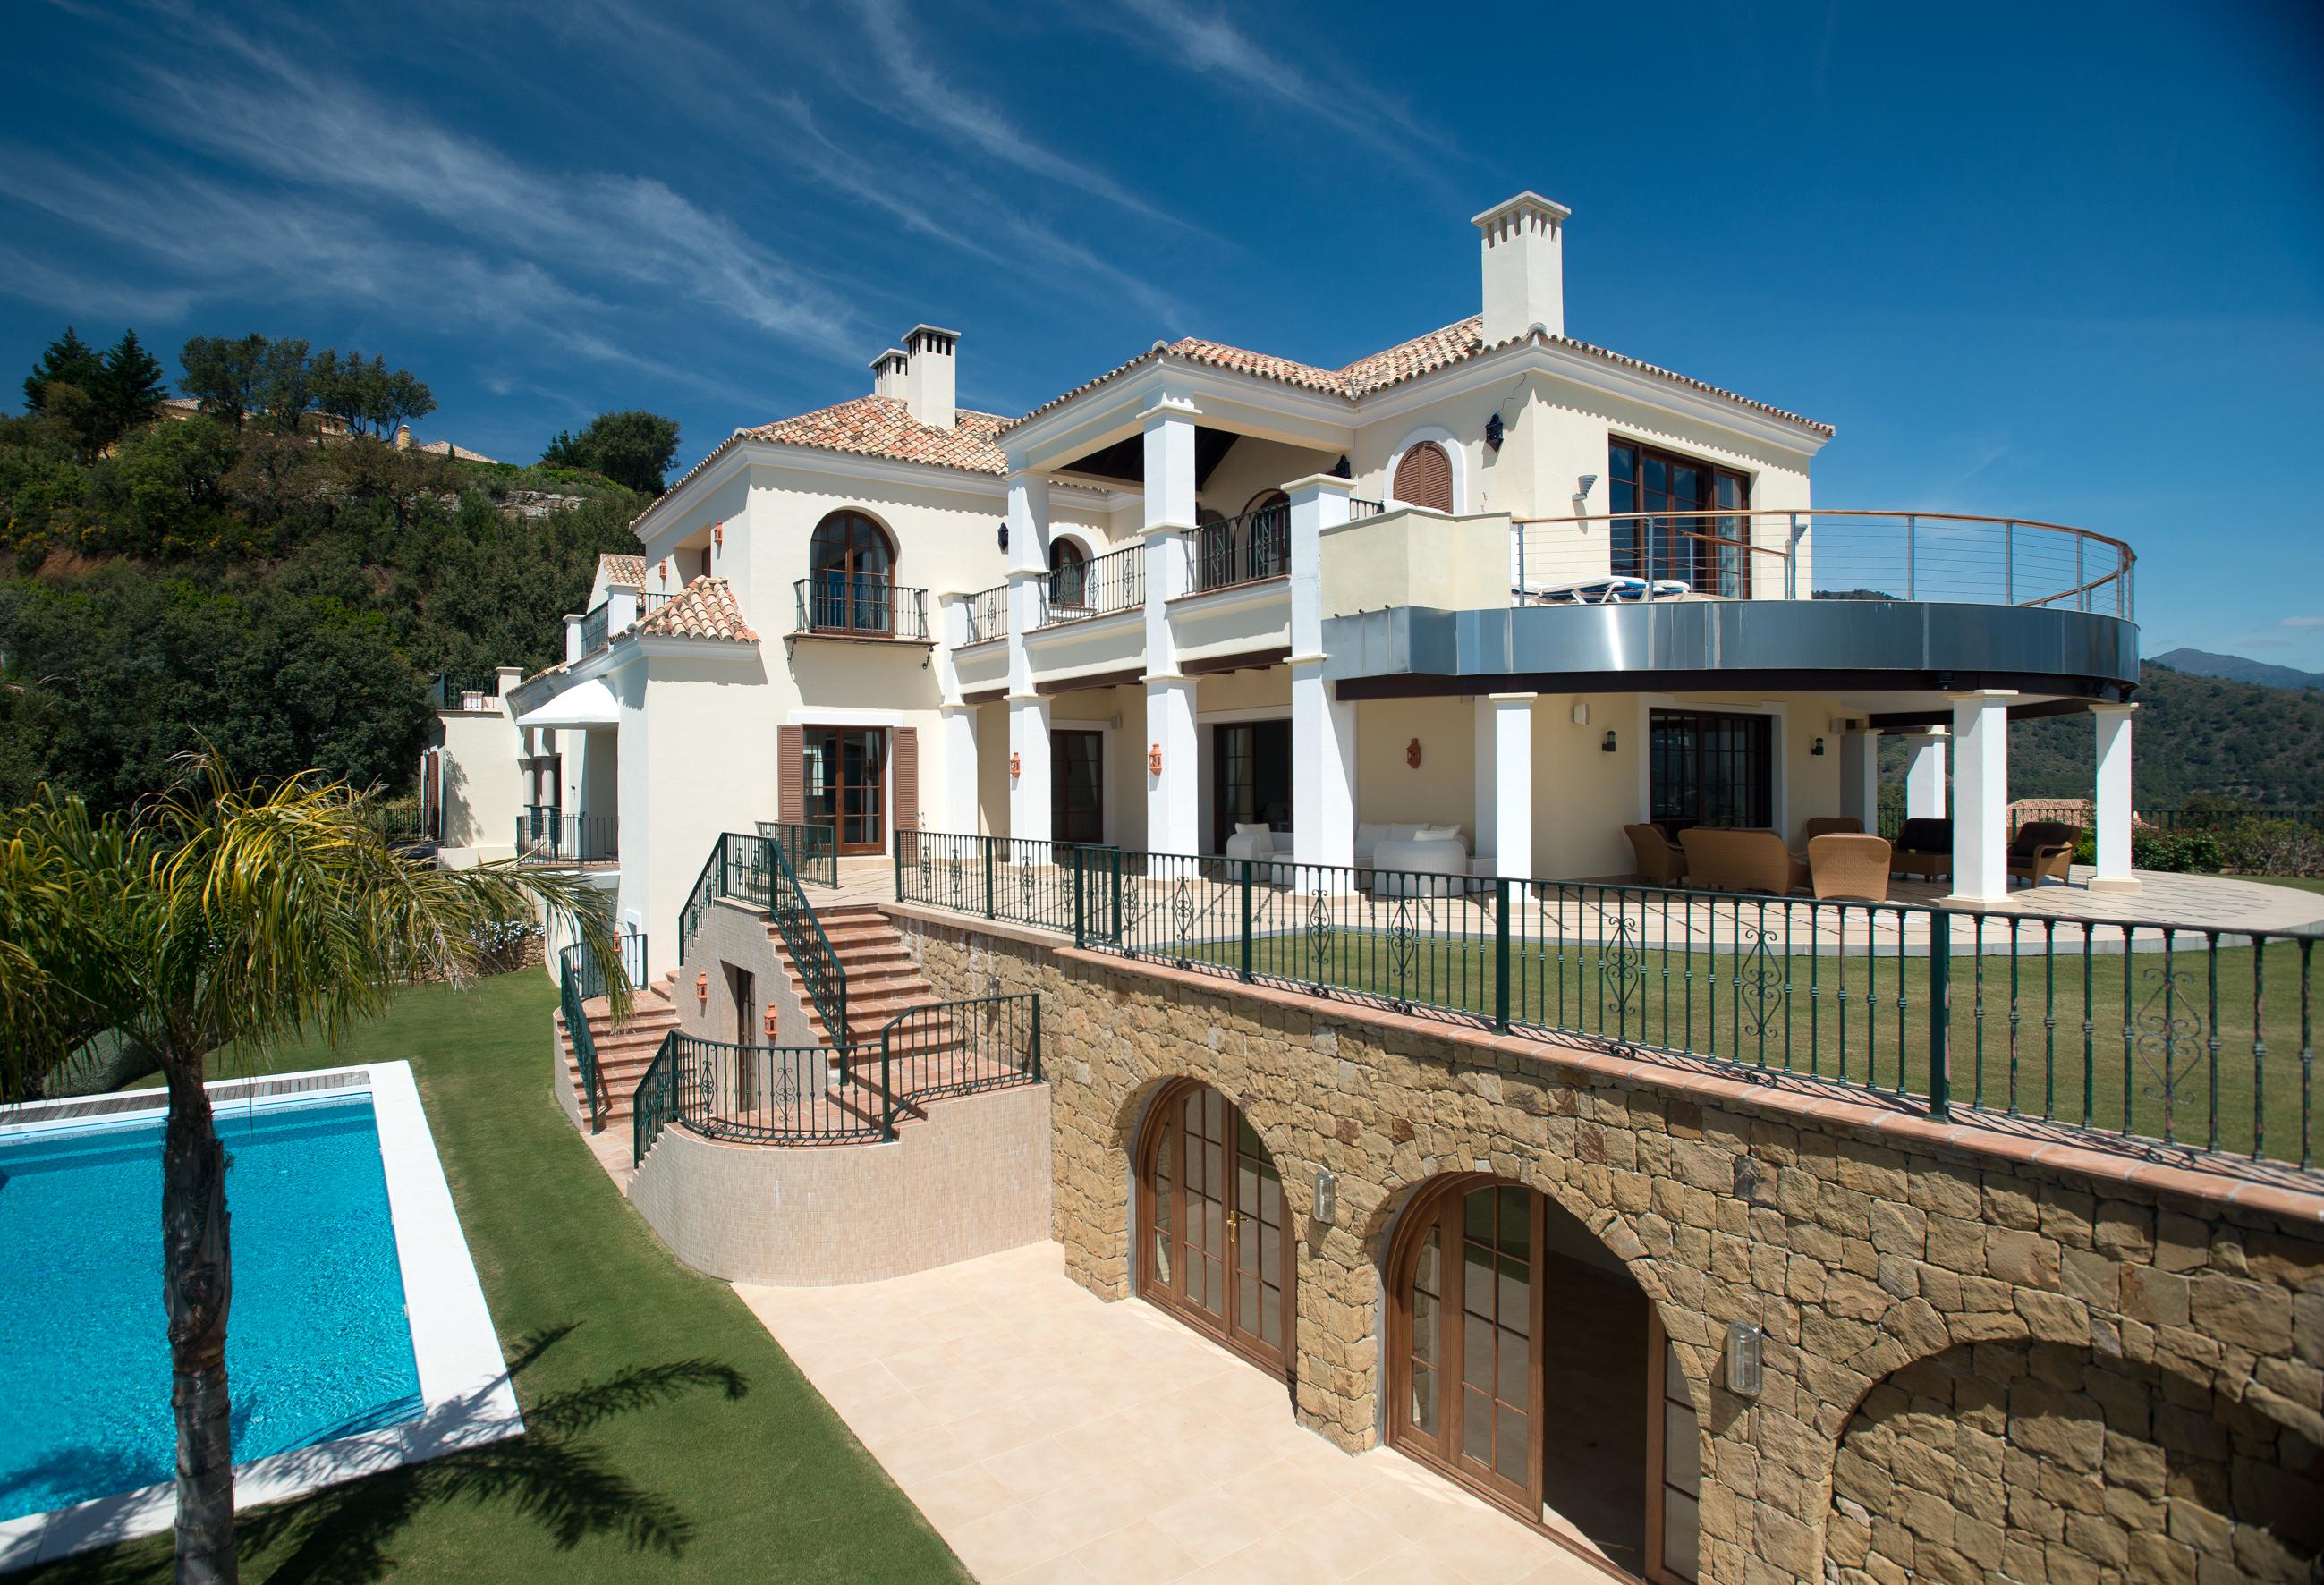 Вилла в Малага, площадь 1580 м², 6 спален